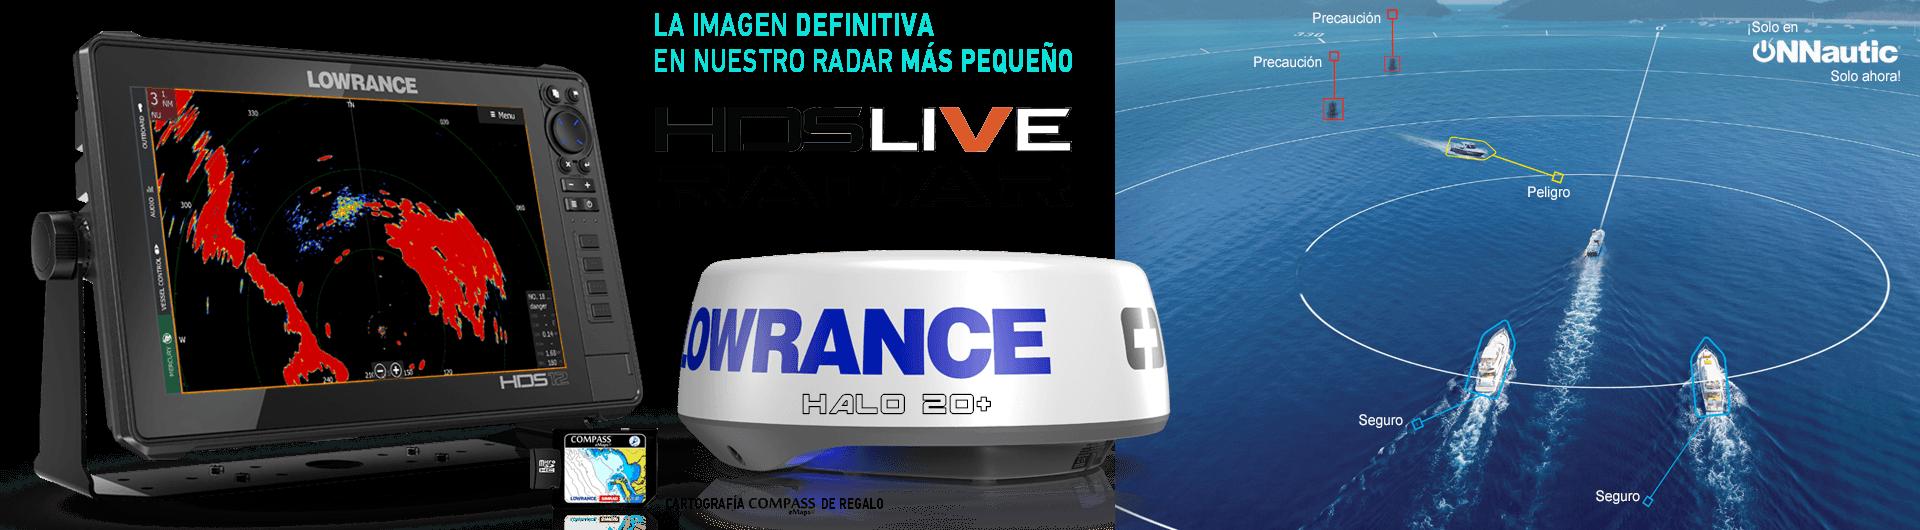 HDS Live Halo20+